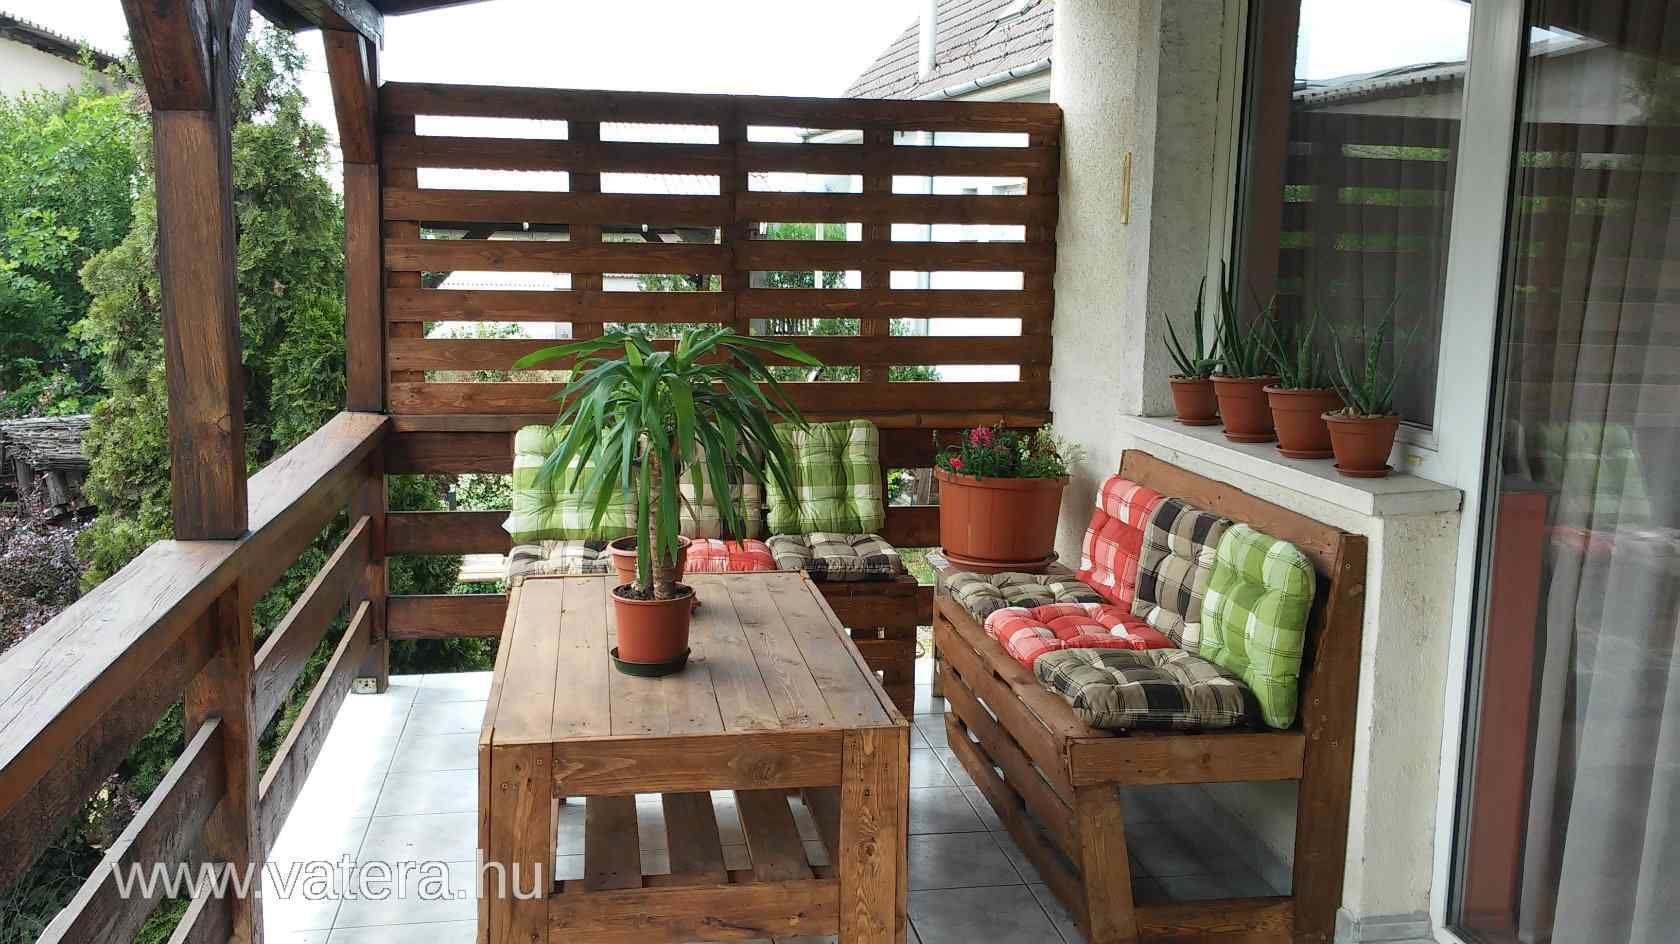 ÚJ fa kerti bútor szett 1 asztal, 2 pad Vatera.hu